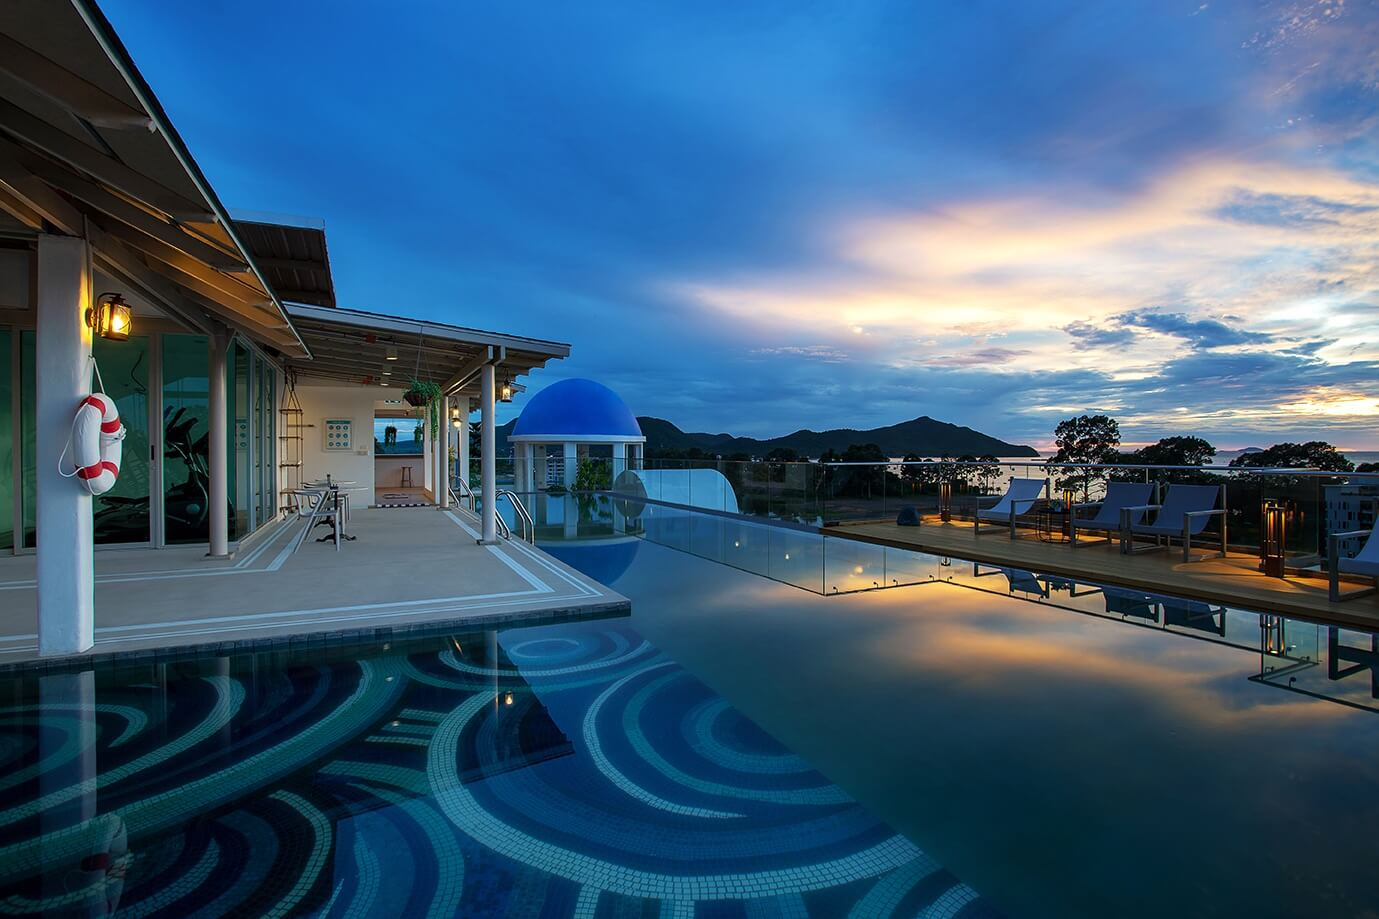 Costa Well Resort Pattaya มอบส่วนลดพิเศษ